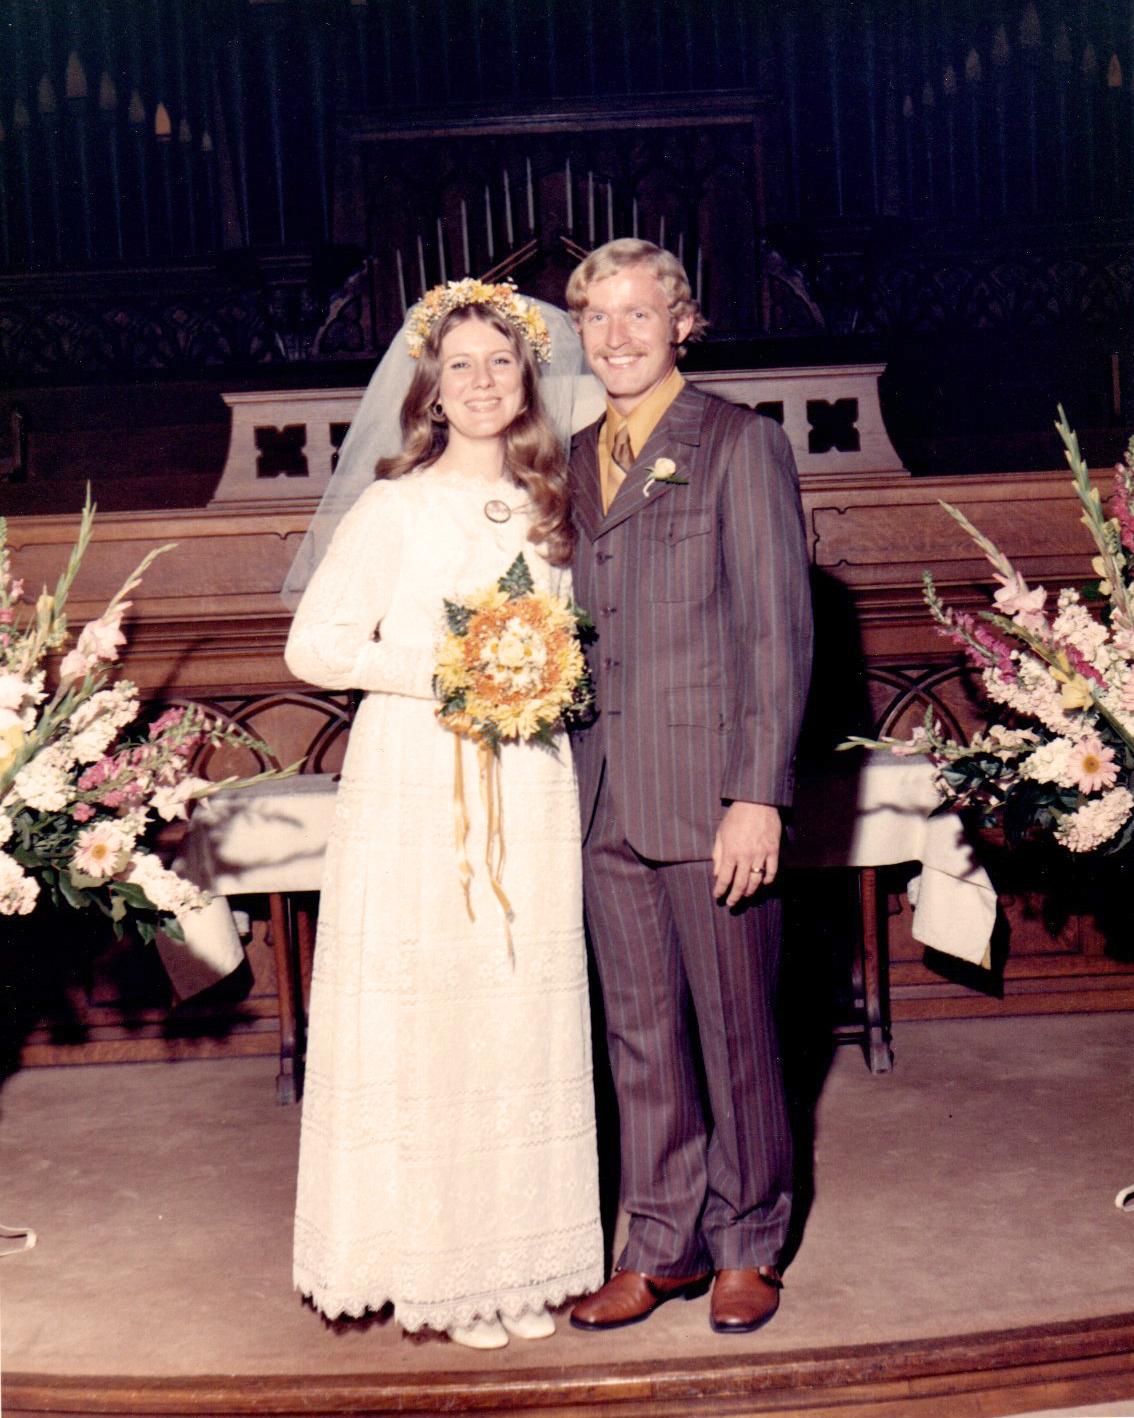 Michael & Beverlee Laird Celebrate 50th Anniversary